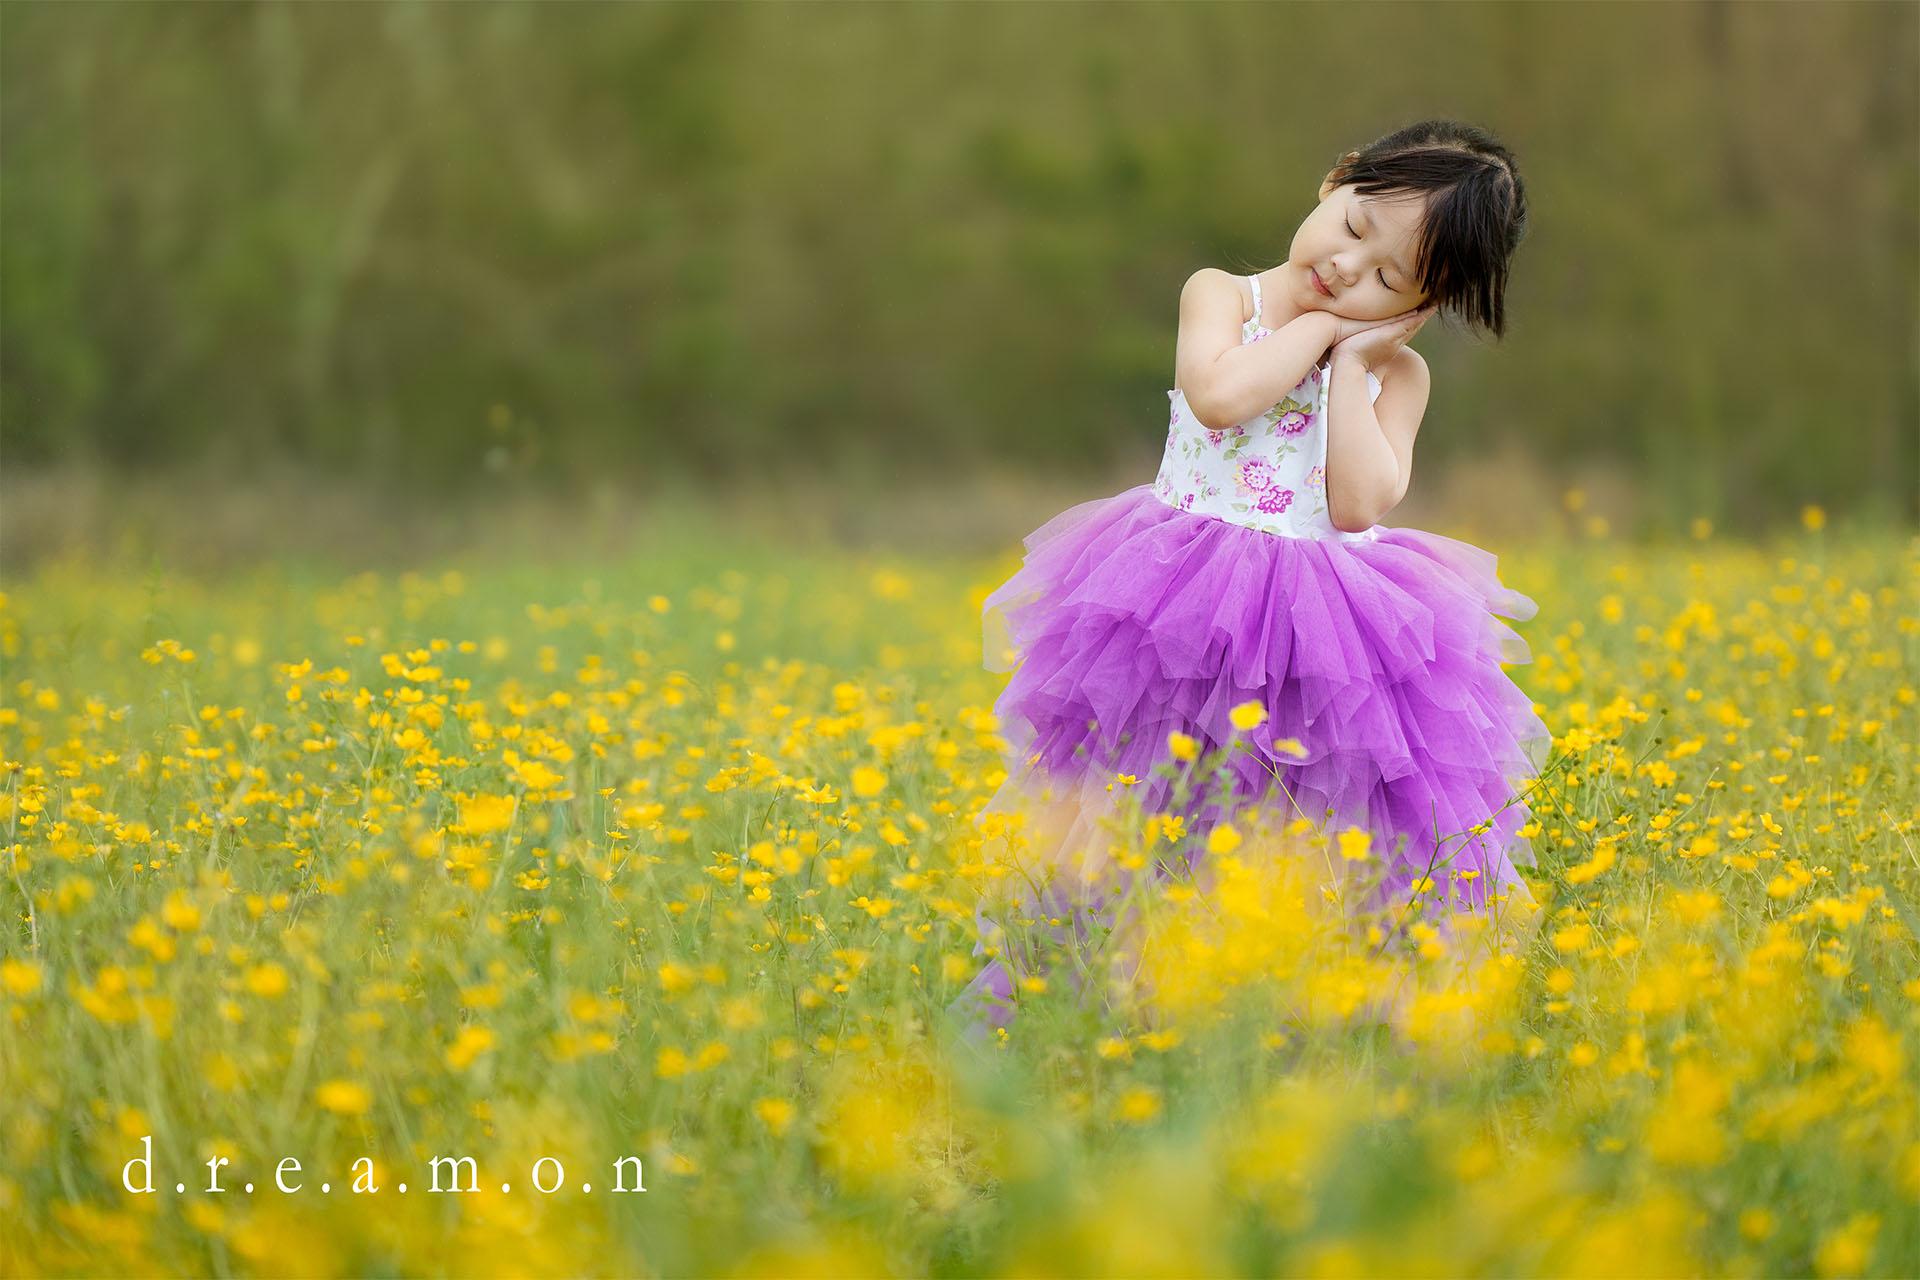 Houston_Pearland_Kid_Children_Photo_Portrait_Photographer